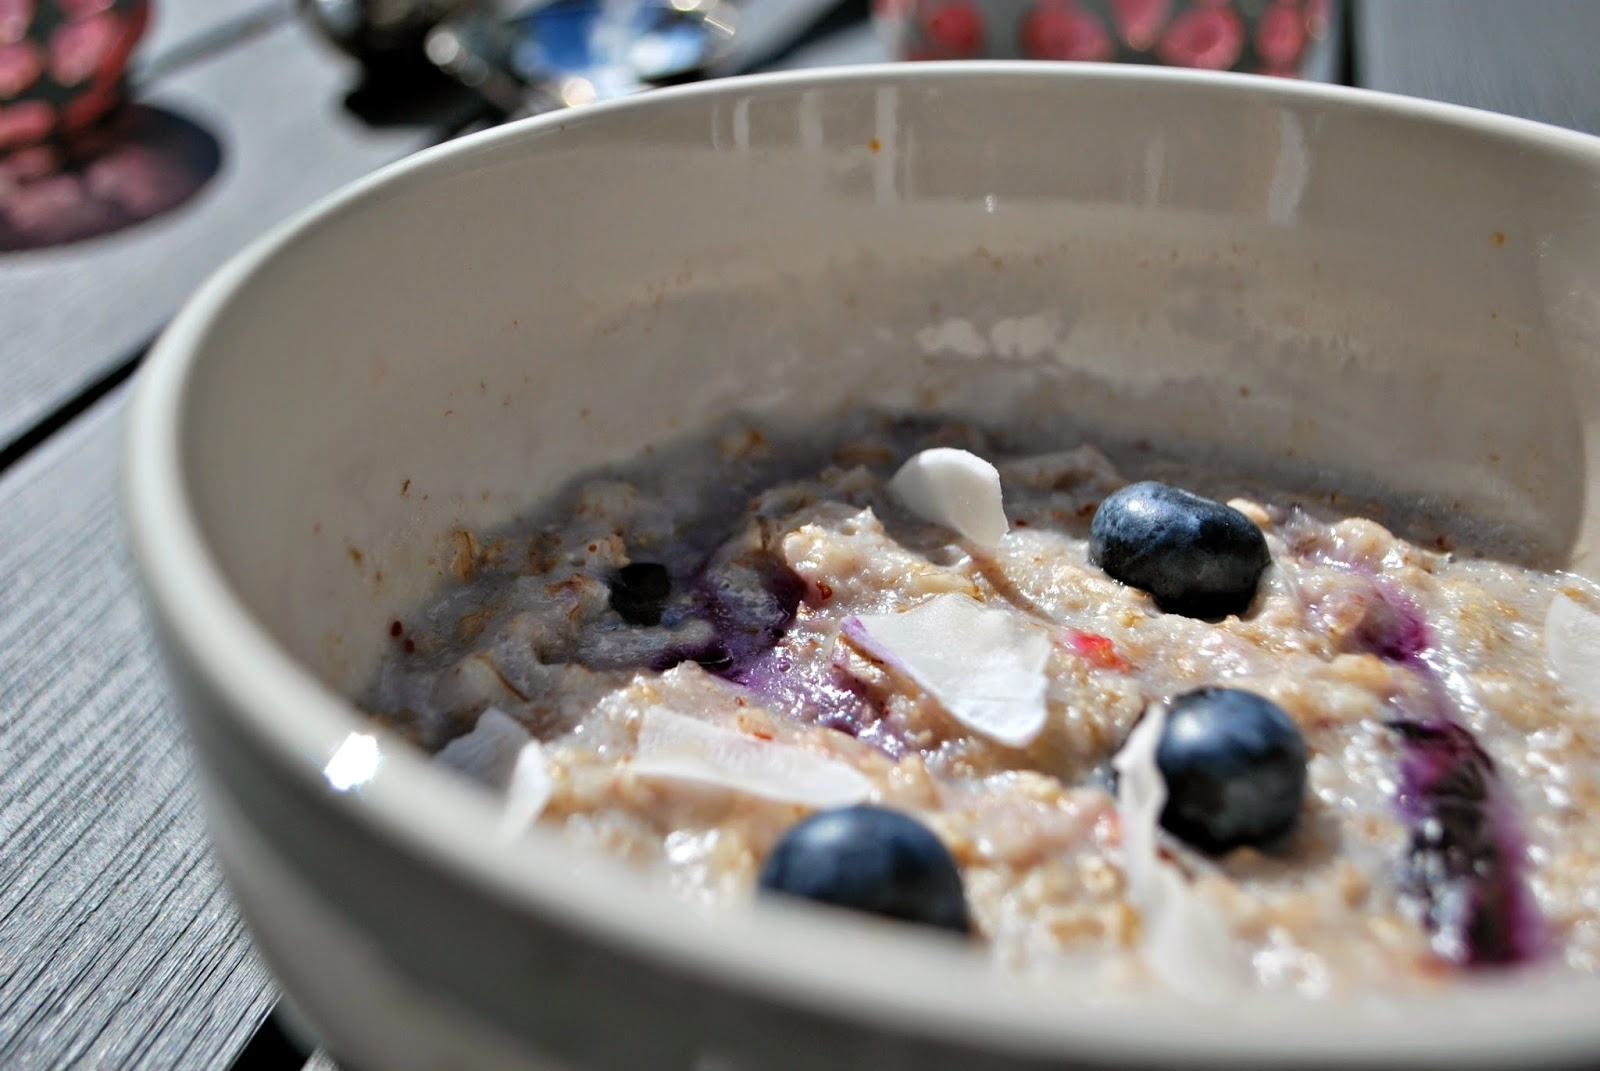 Bowl of Blueberry Coconut Porridge